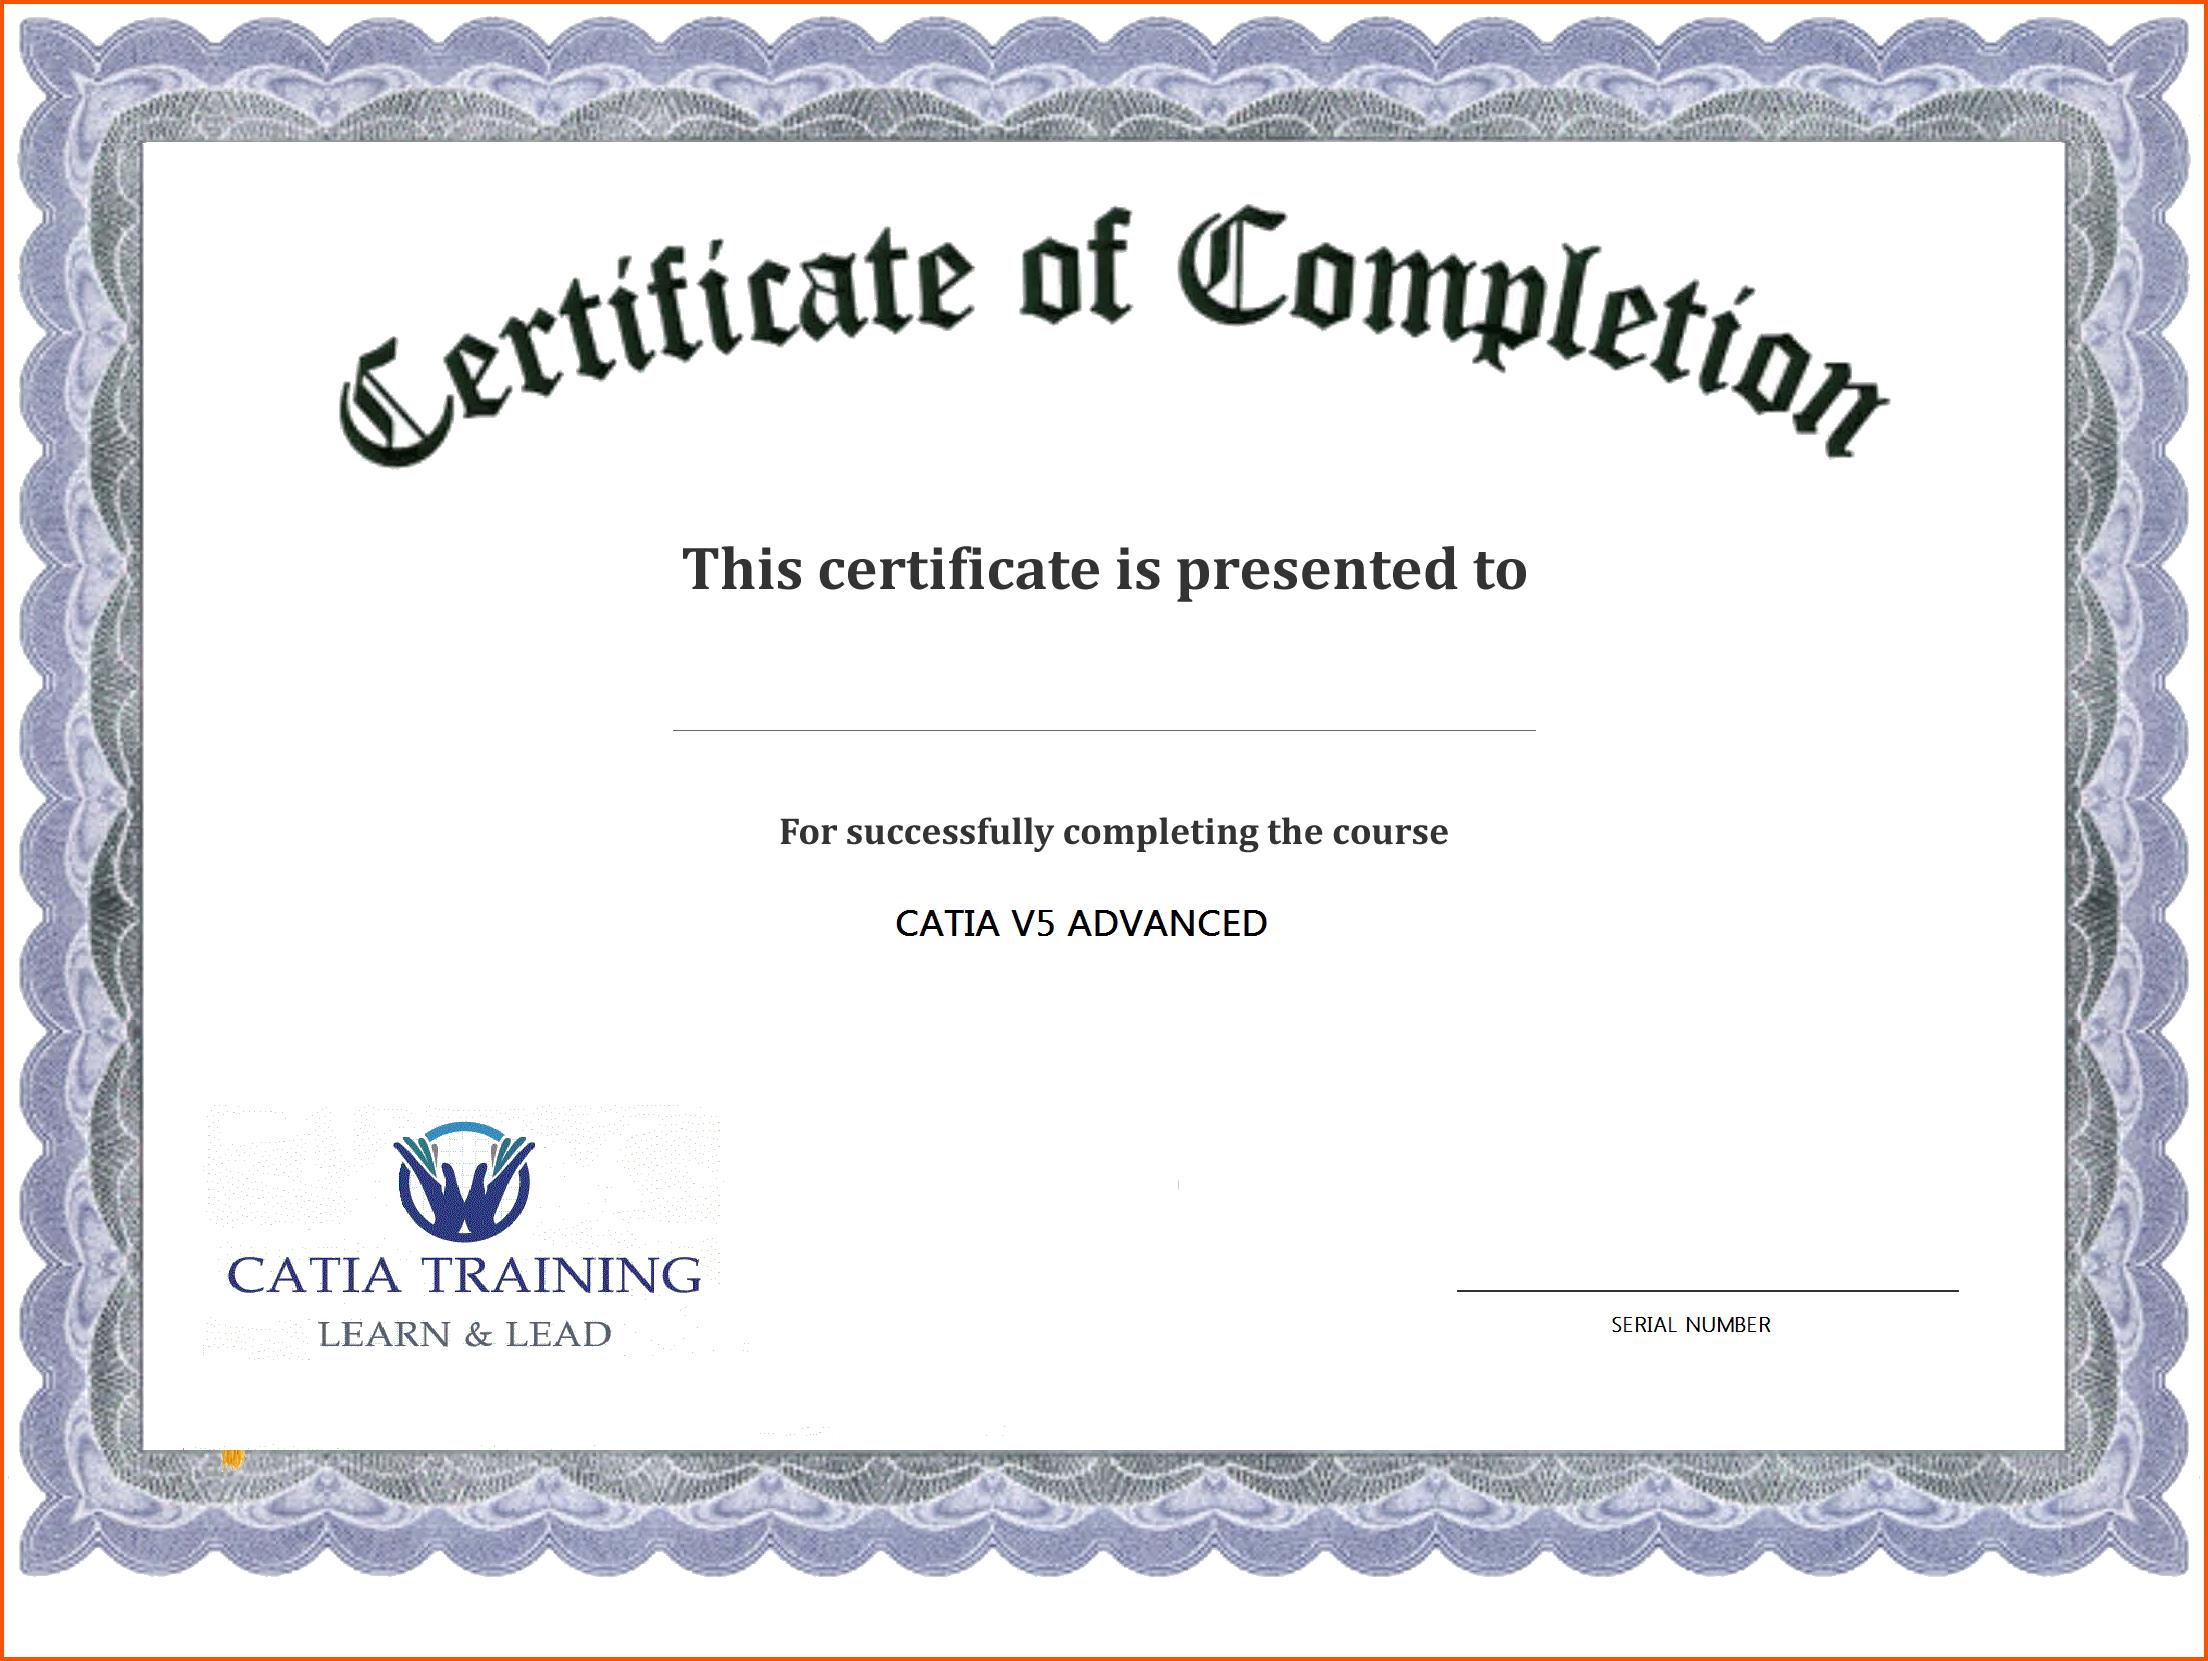 Printable Certificate Templates - Tutlin.psstech.co - Free Customizable Printable Certificates Of Achievement